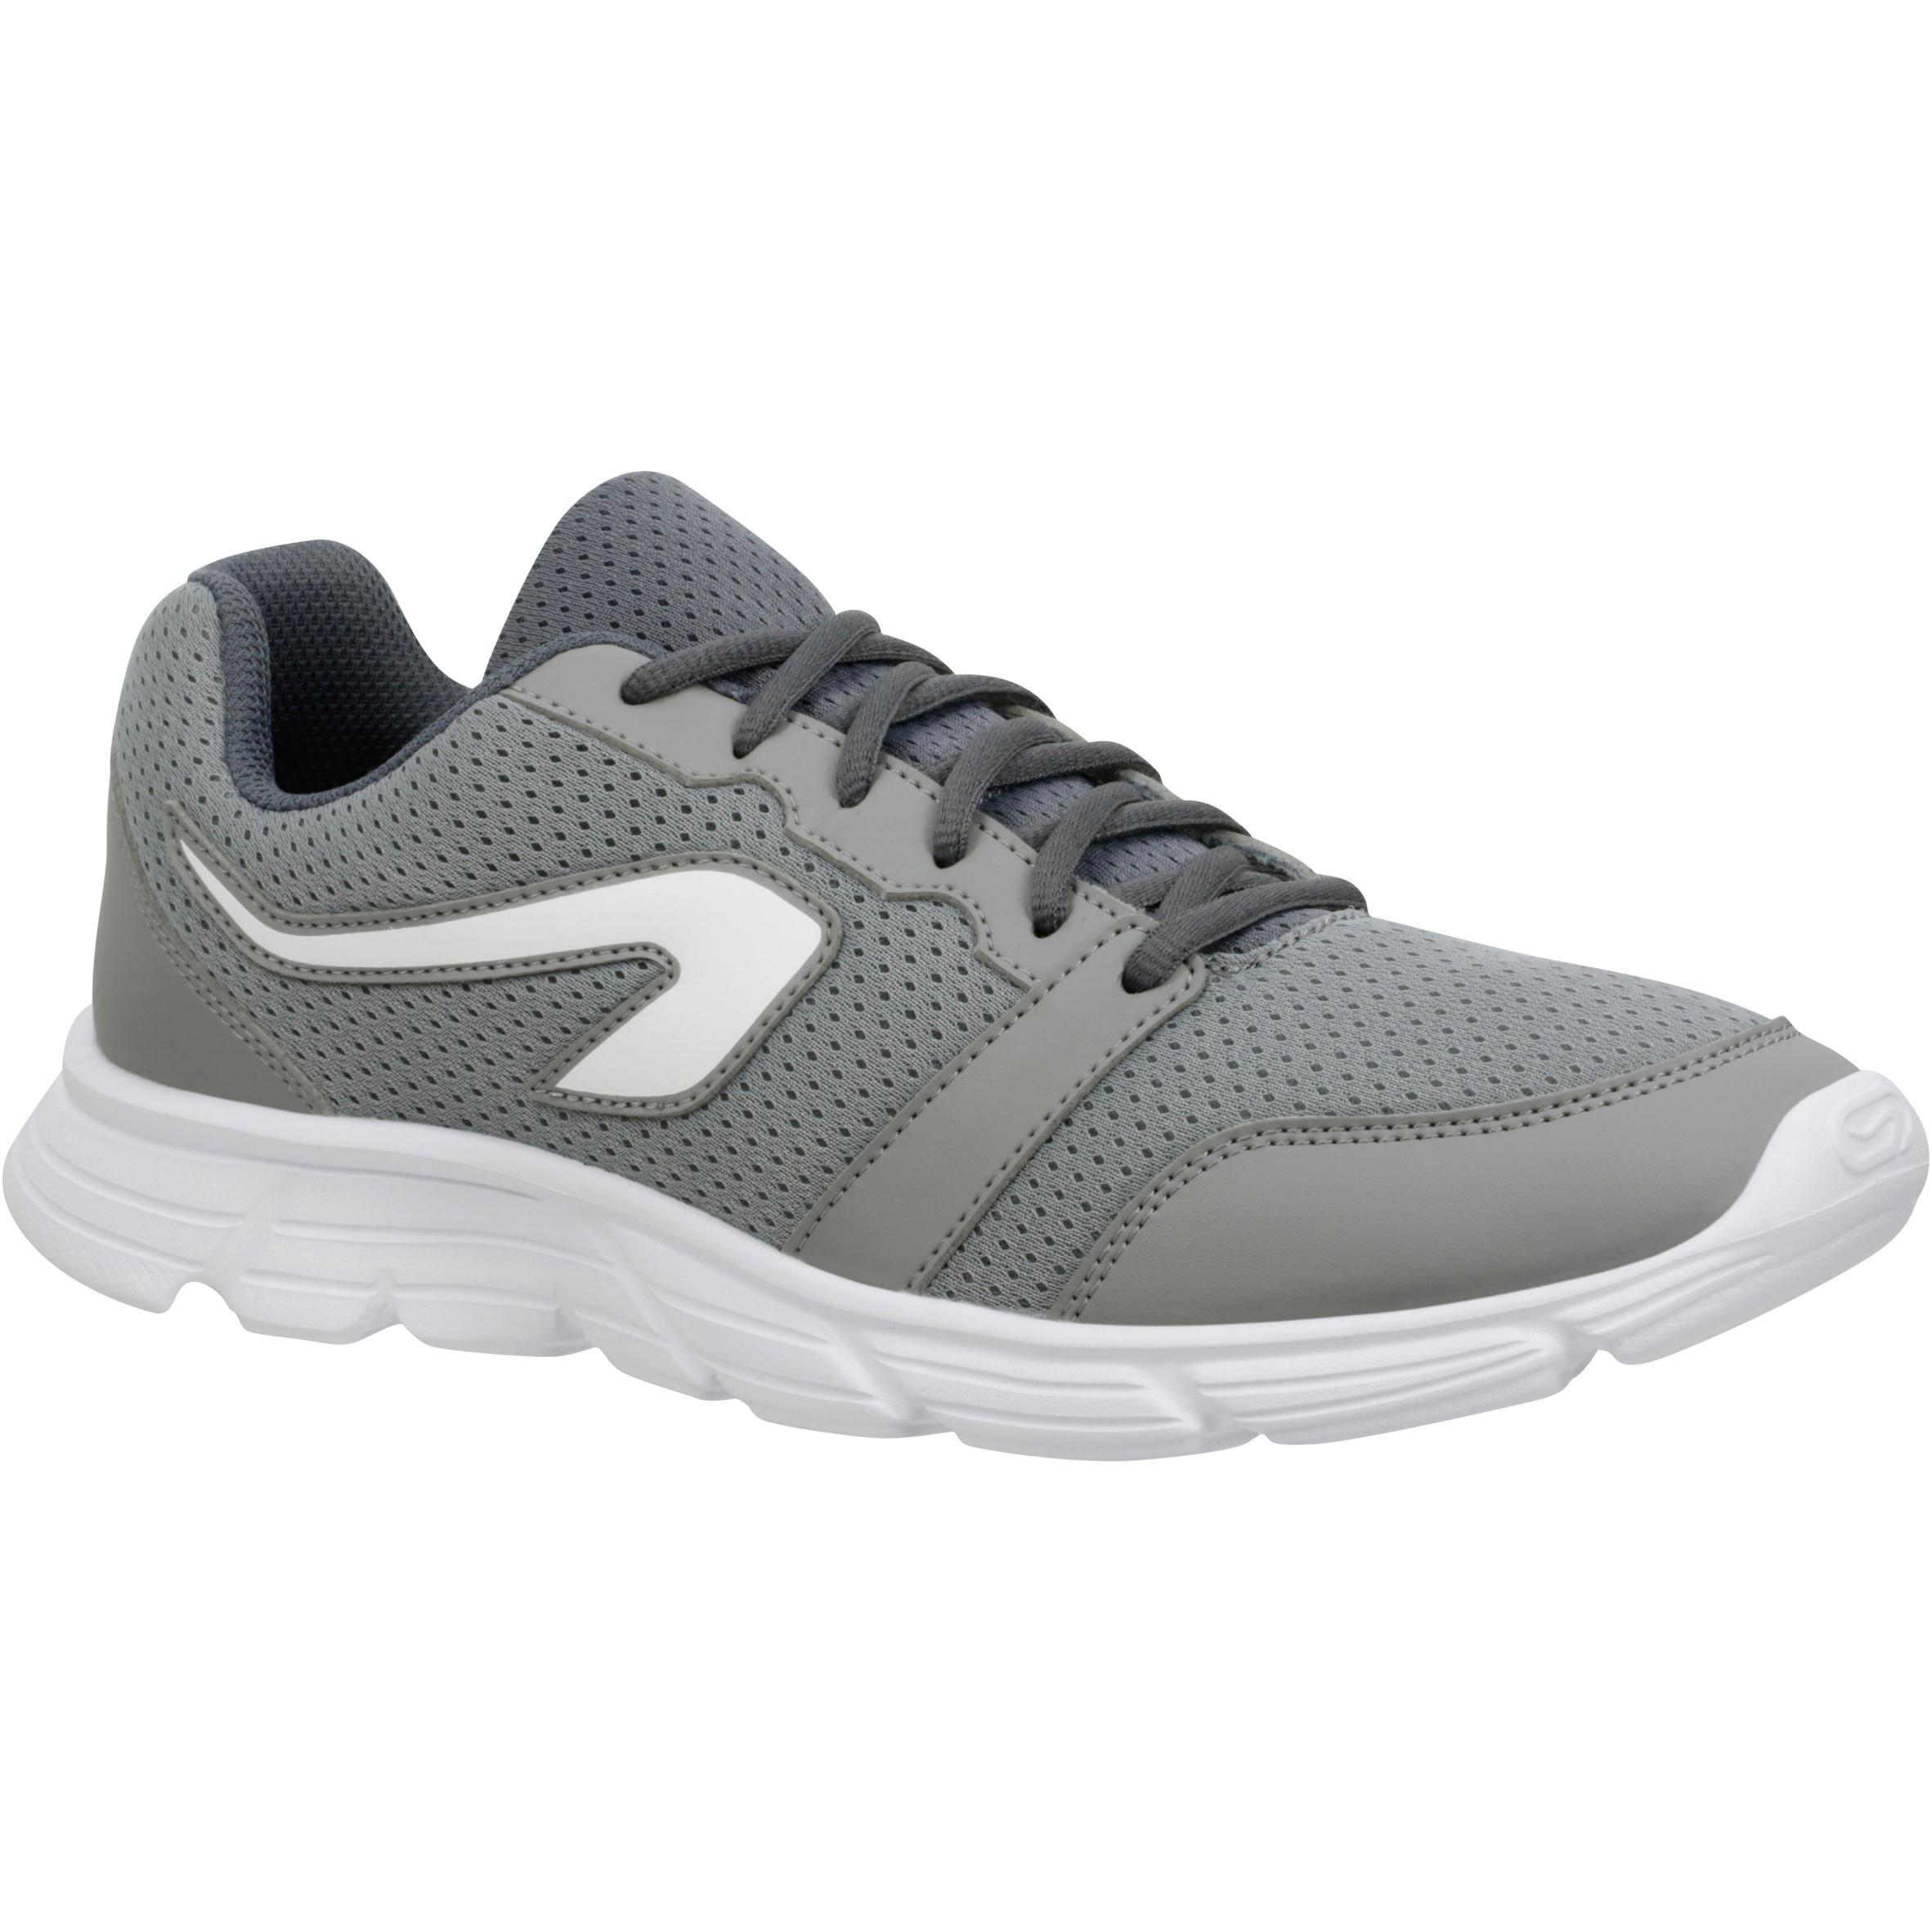 5b579b33c09 Comprar zapatillas de running para correr hombre